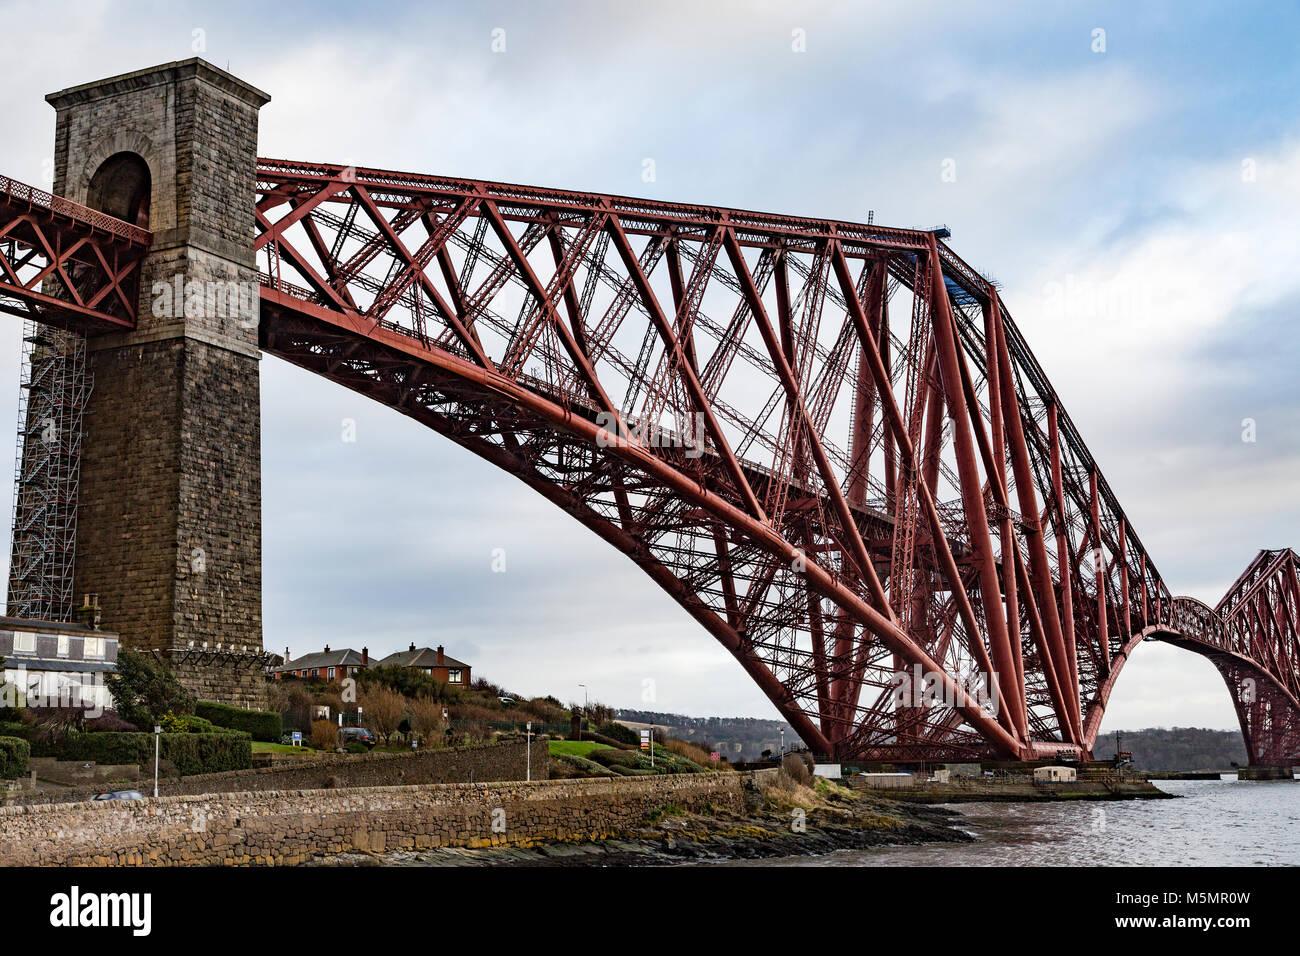 Forth Railway Bridge, Scotland - Stock Image